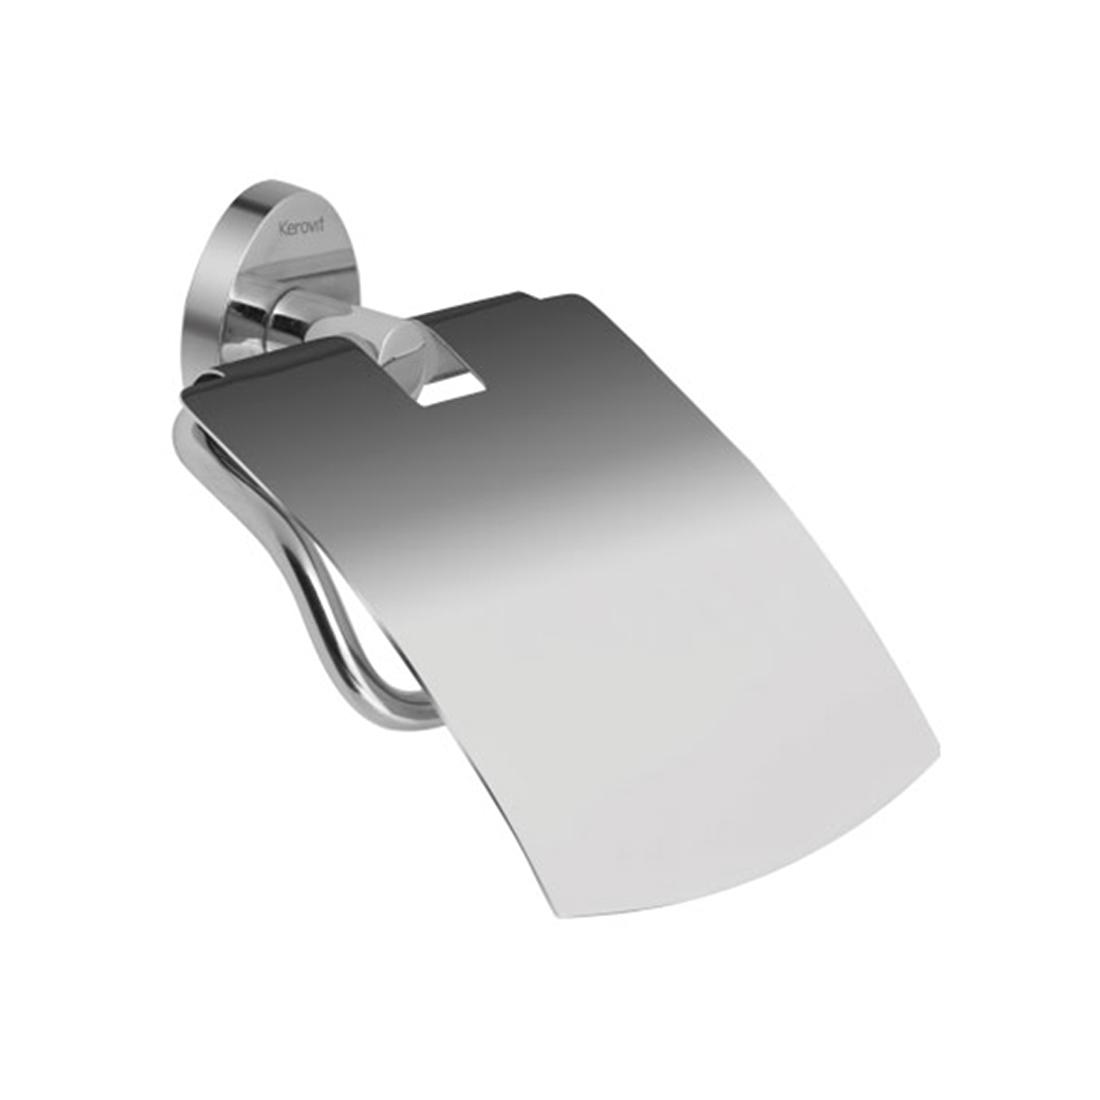 Kerovit KA980009 Oval Range Toilet Paper Holder With Flap